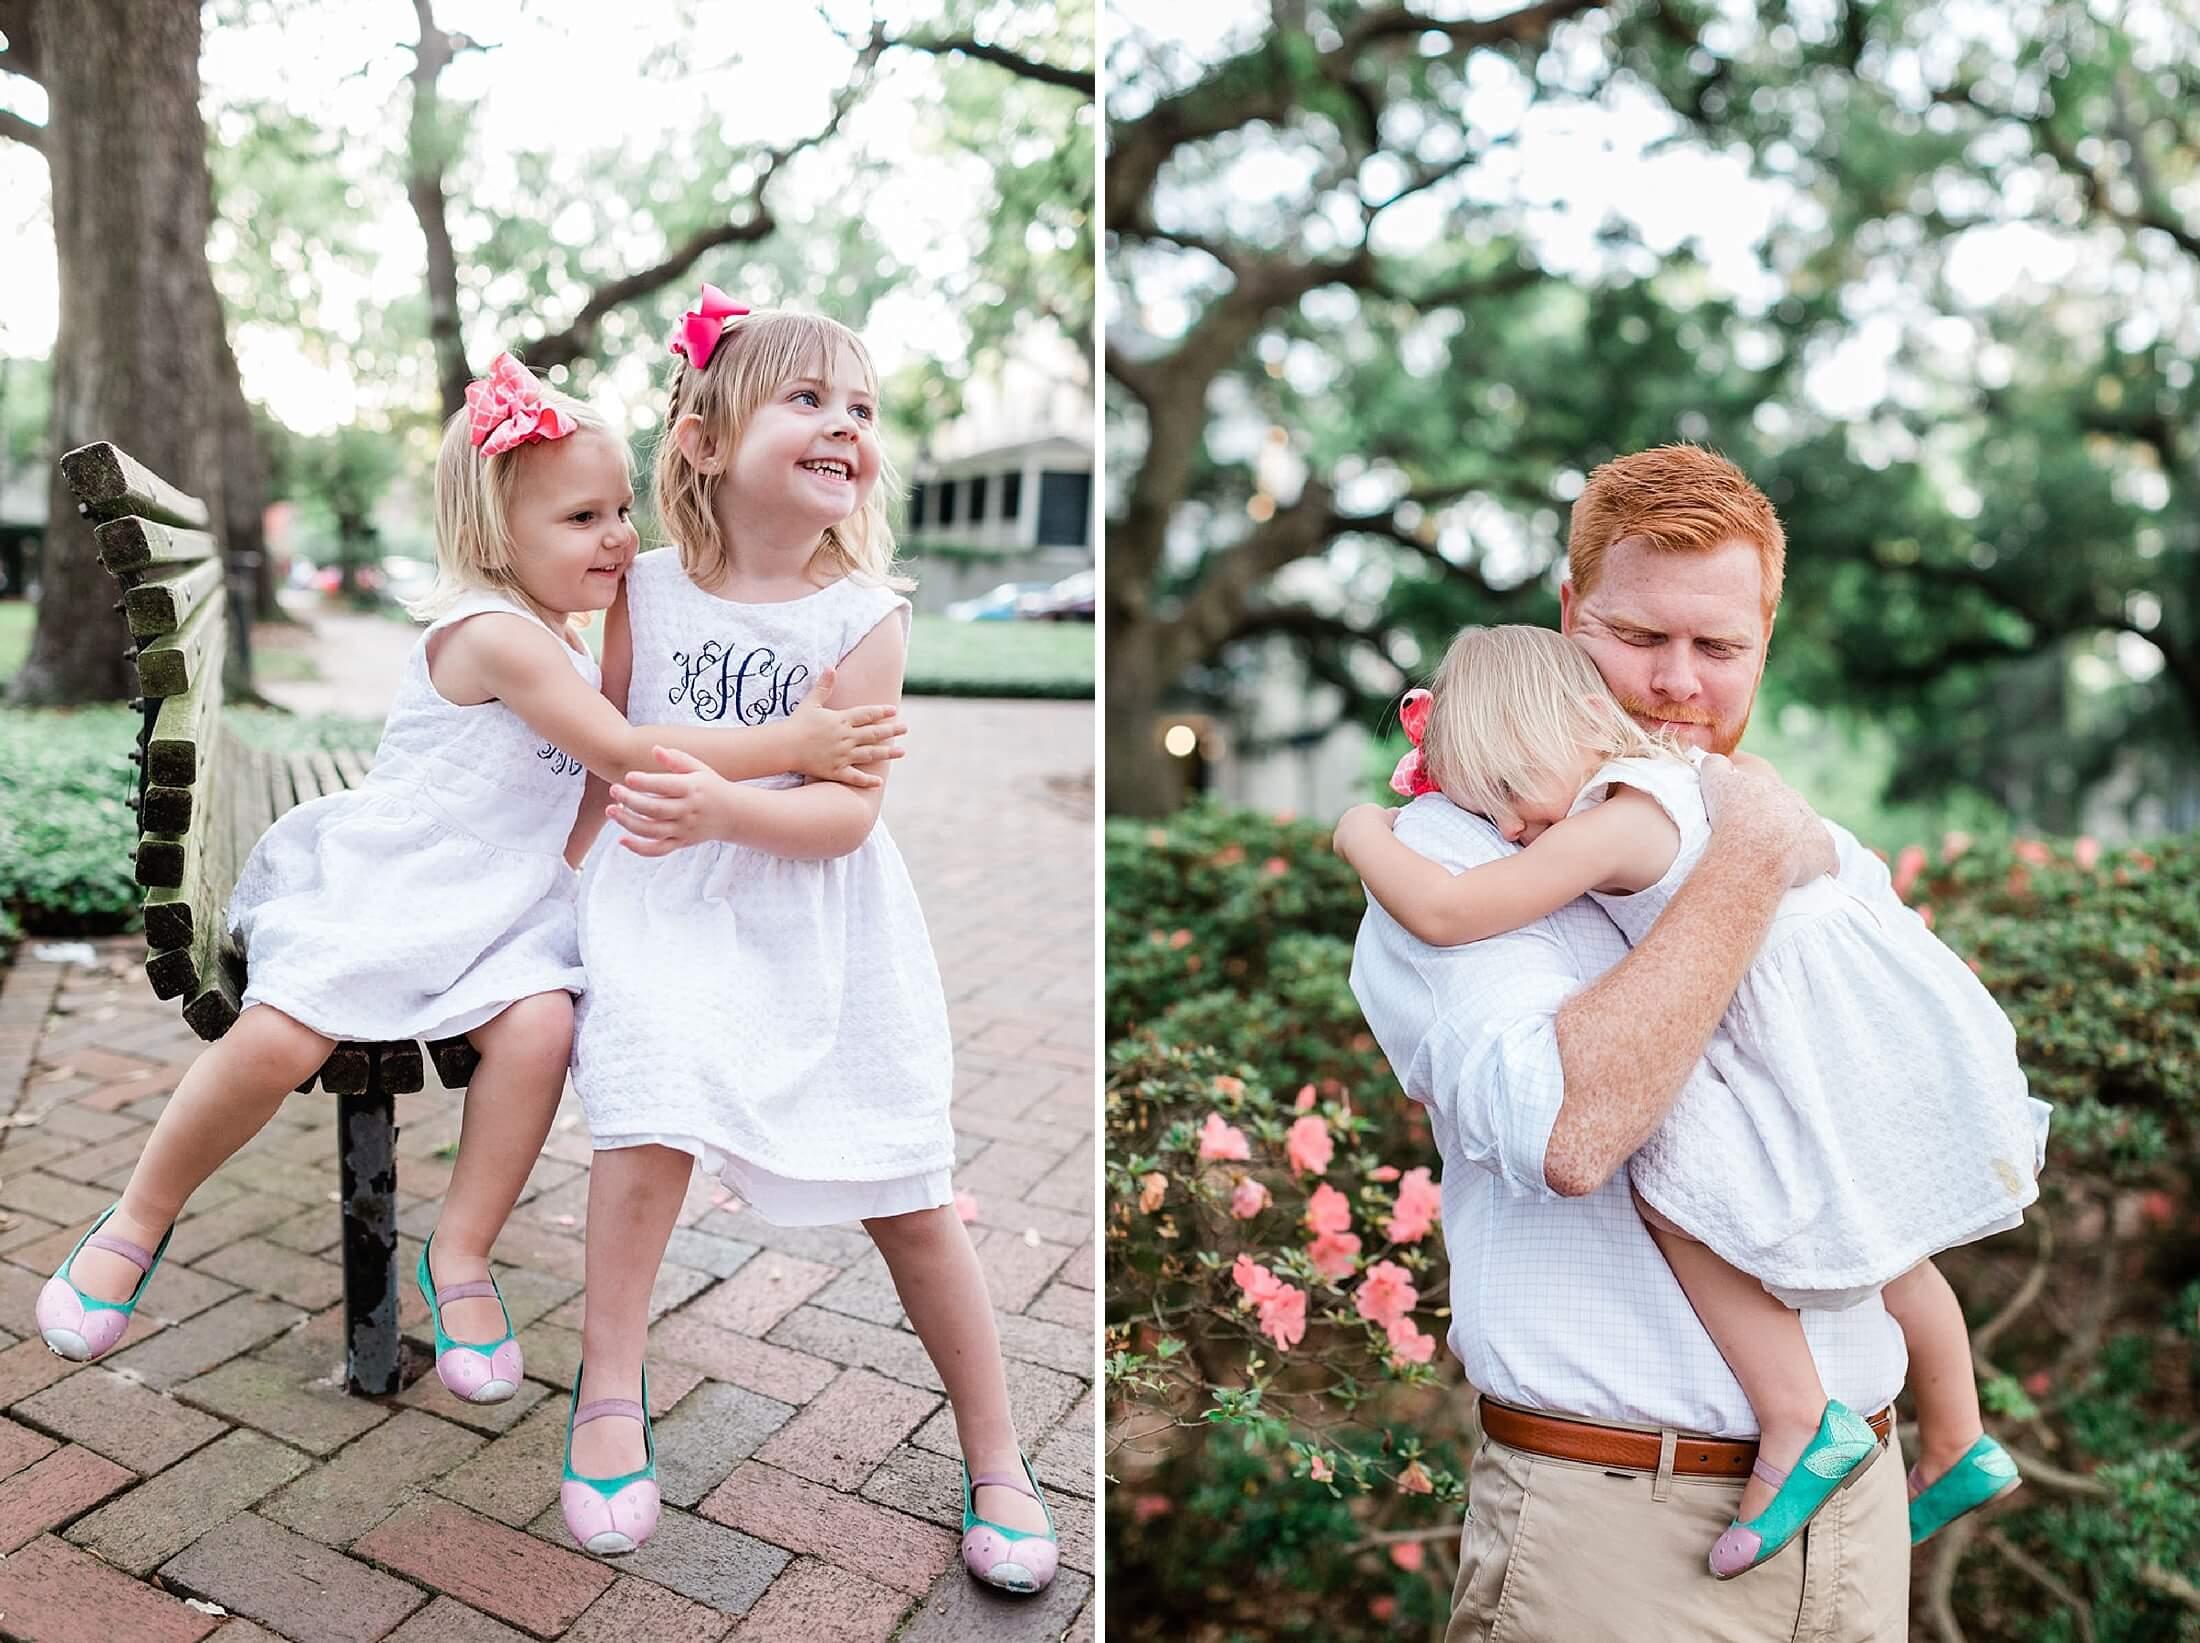 Apt-b-photography-savannah-engagement-photographer-savannah-family-kid-hilton-head-elopement-savannah-wedding-photographer-1.jpg